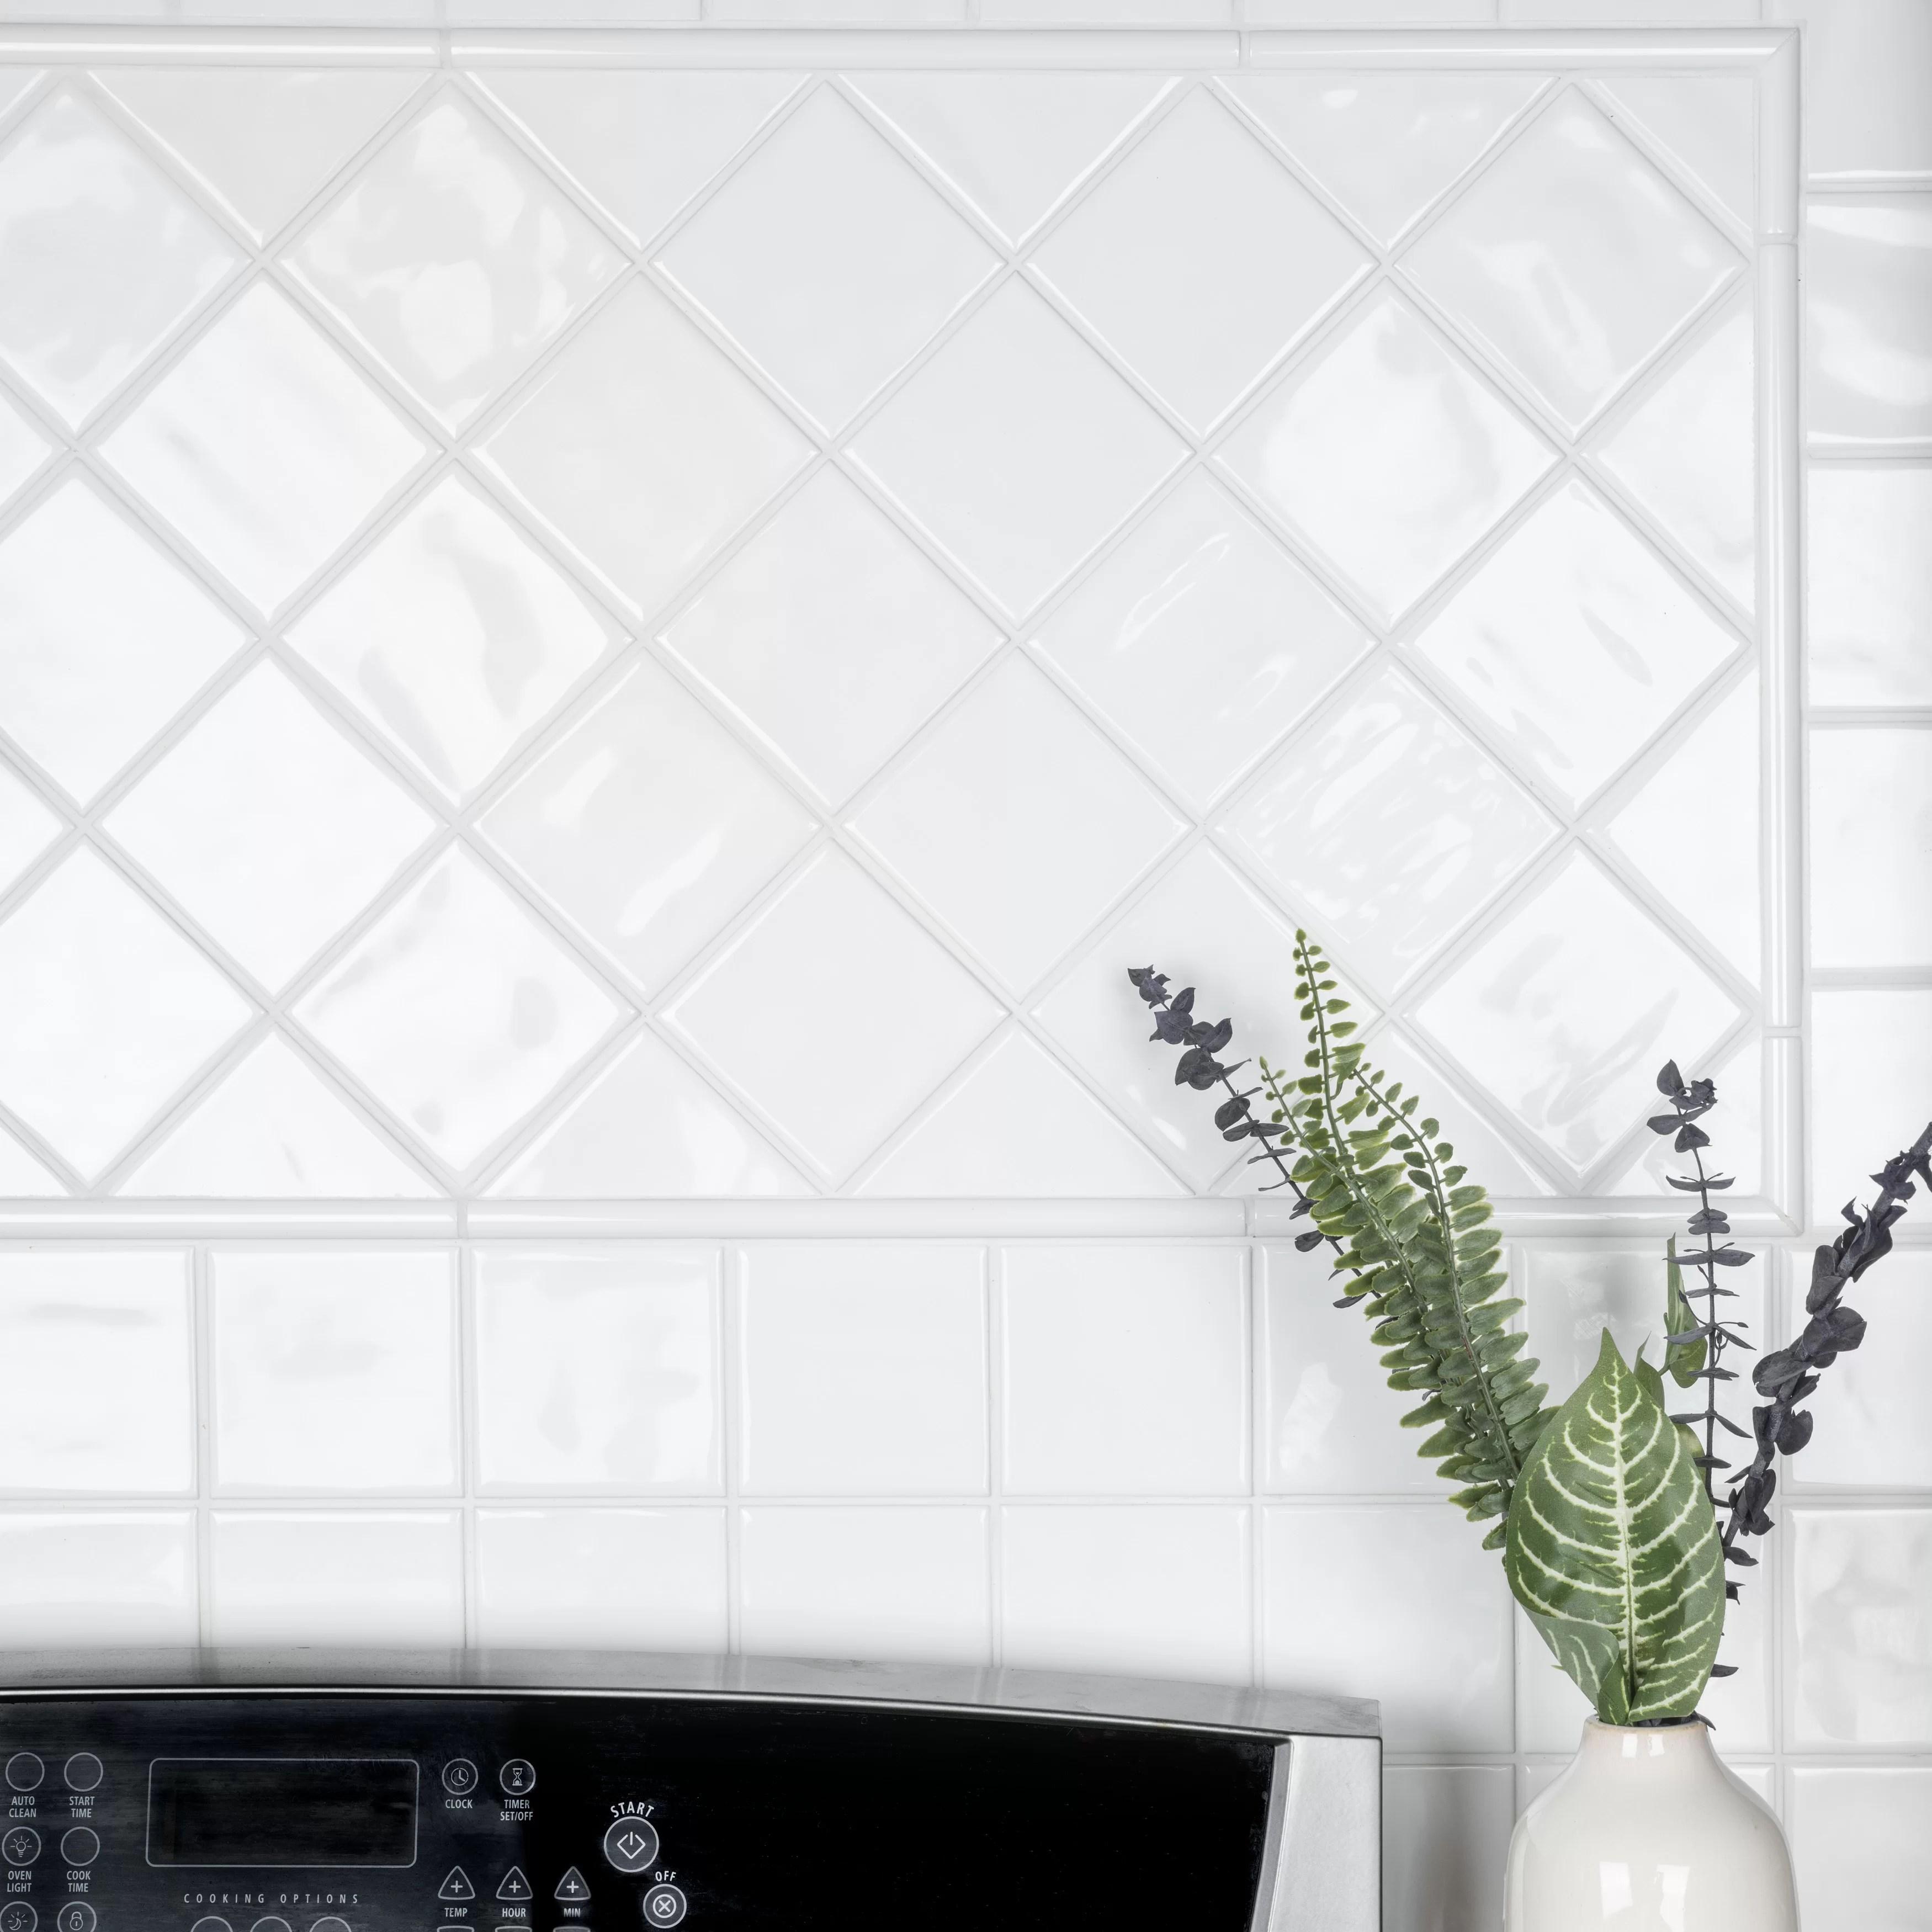 twist 11 8 x 0 5 glossy ceramic quarter round tile trim in white